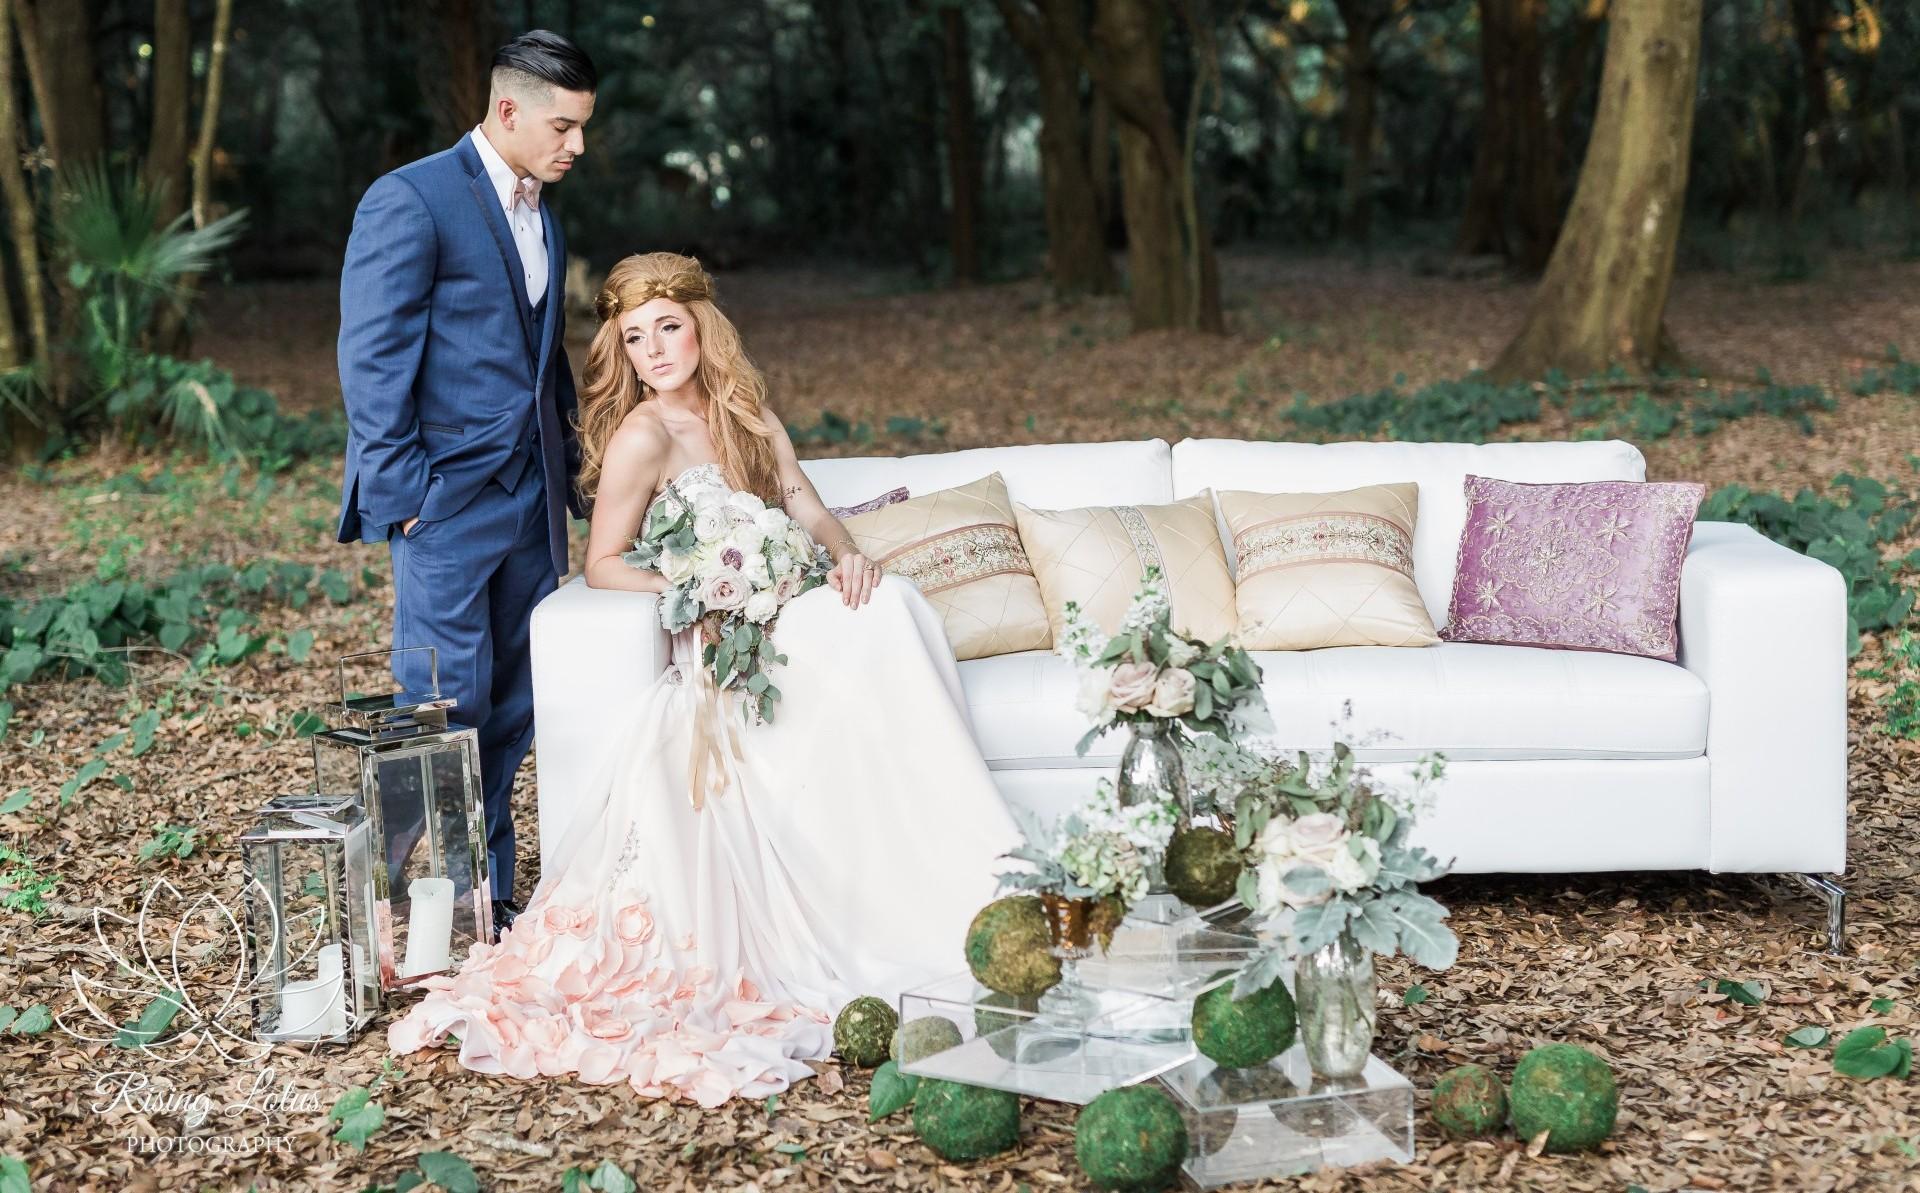 Tampa Bays Luxury Wedding Event And Formalwear Attire